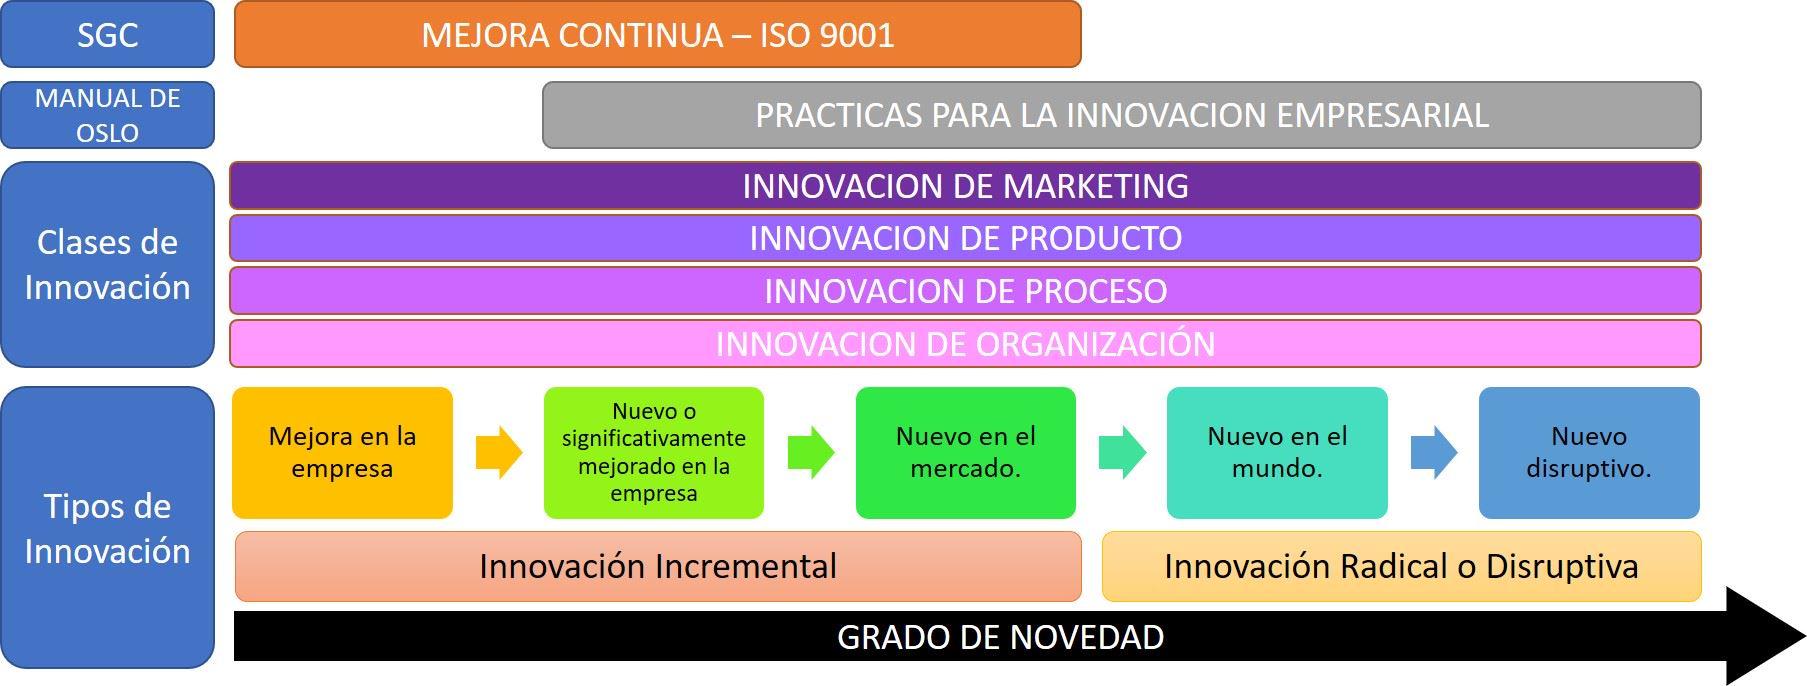 Diagrama Innovacion Mejora Continua